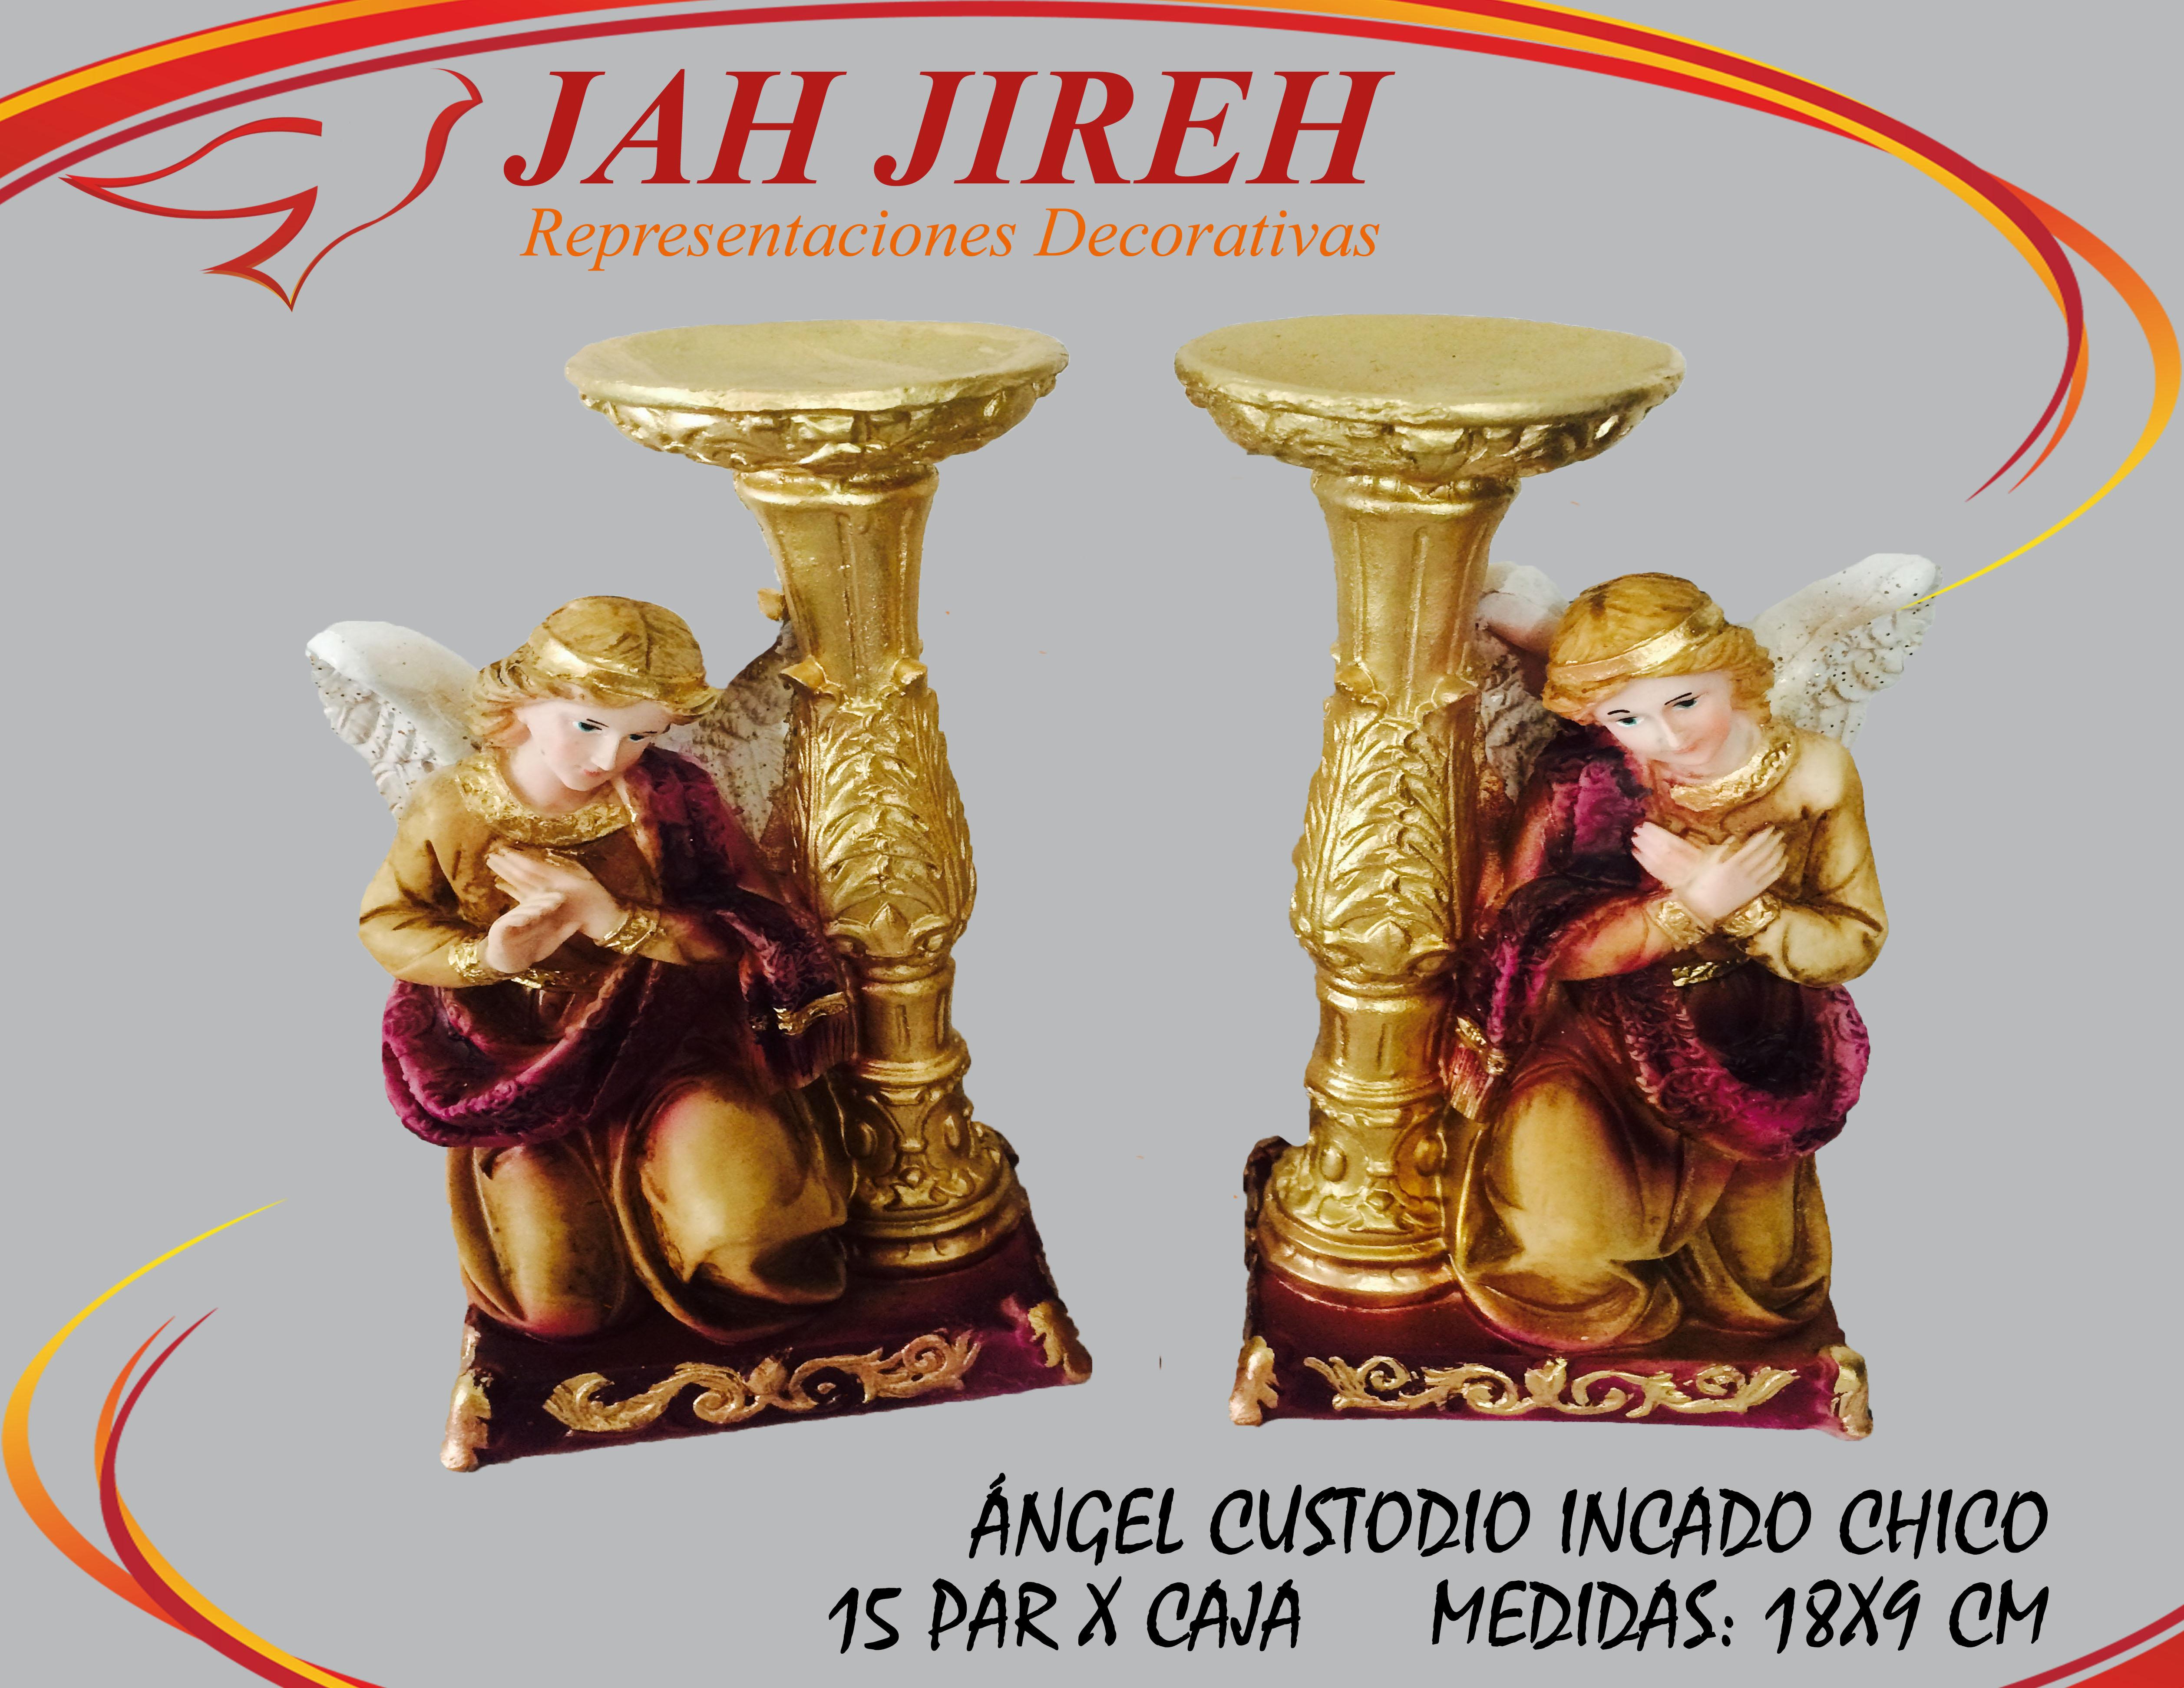 https://0201.nccdn.net/1_2/000/000/08e/8d6/angel-custodio-incado-chico.jpg